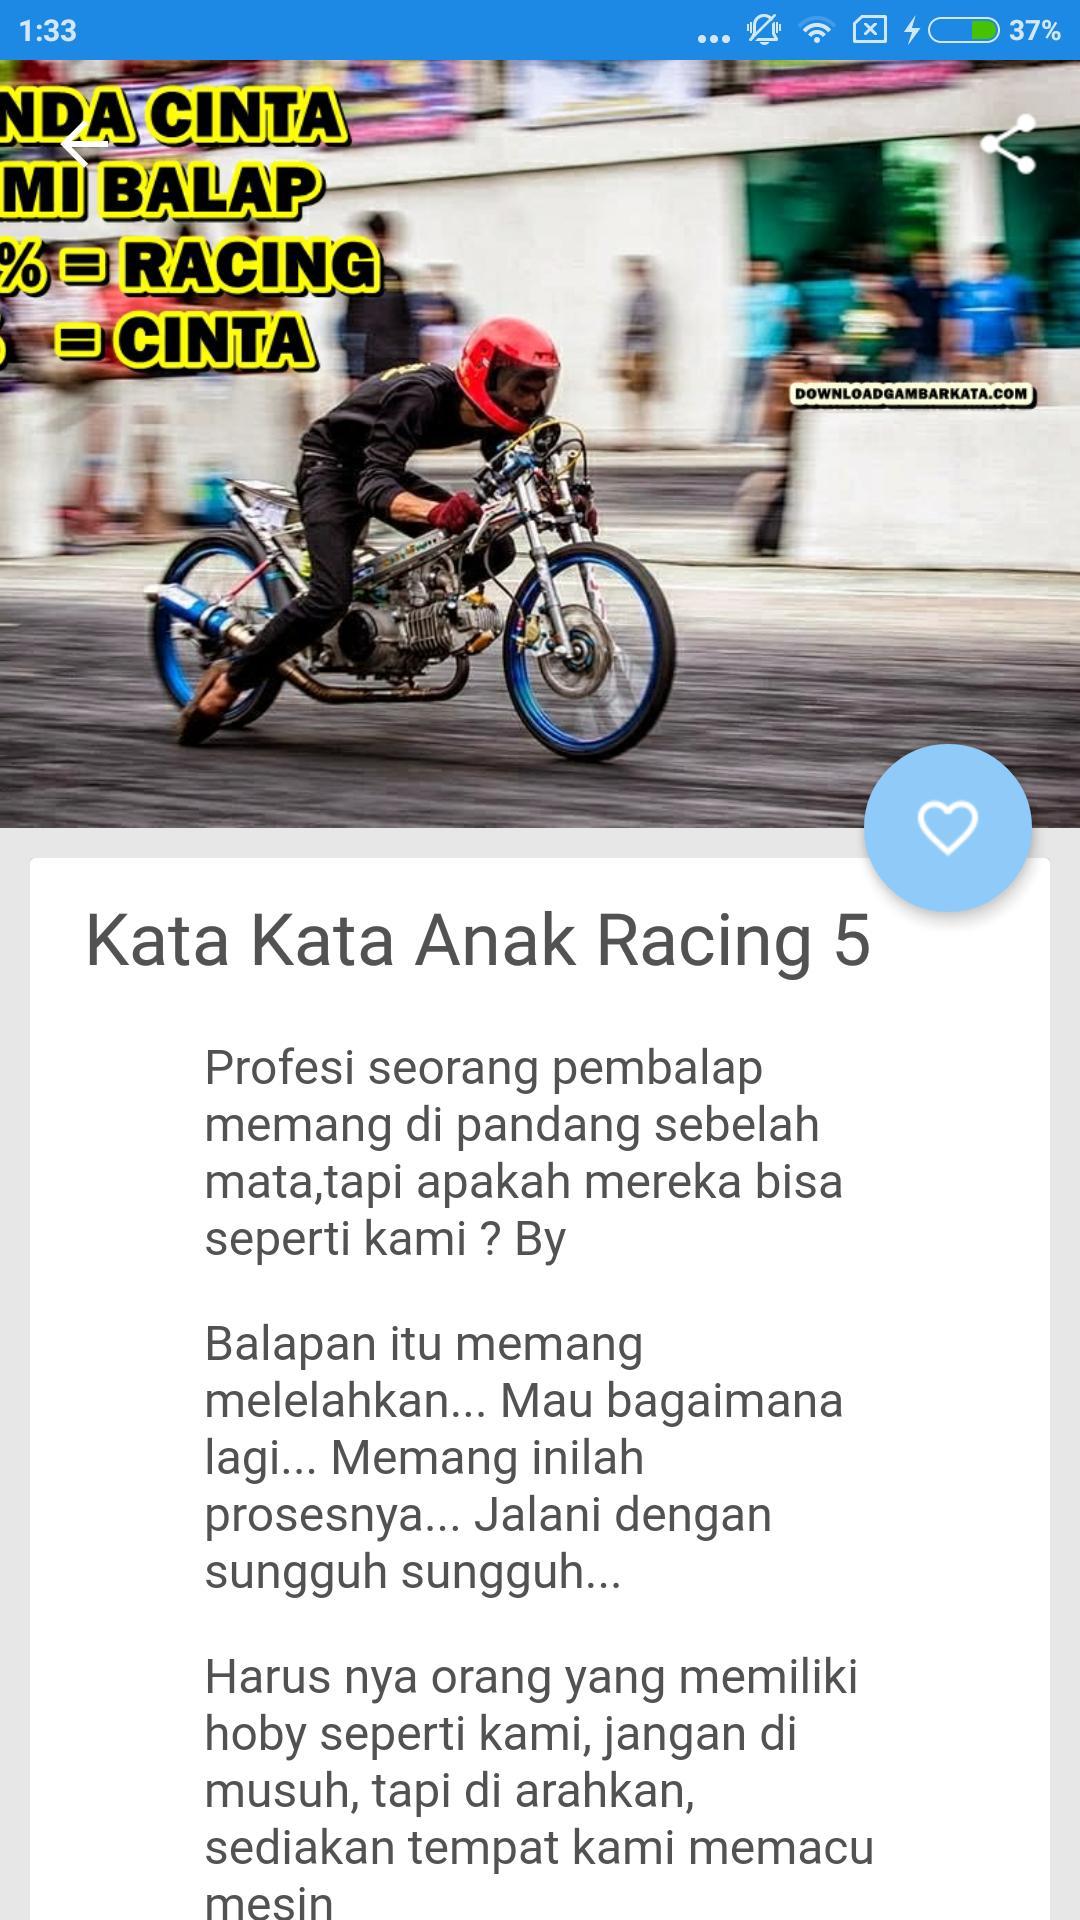 Kata Kata Anak Racing For Android Apk Download